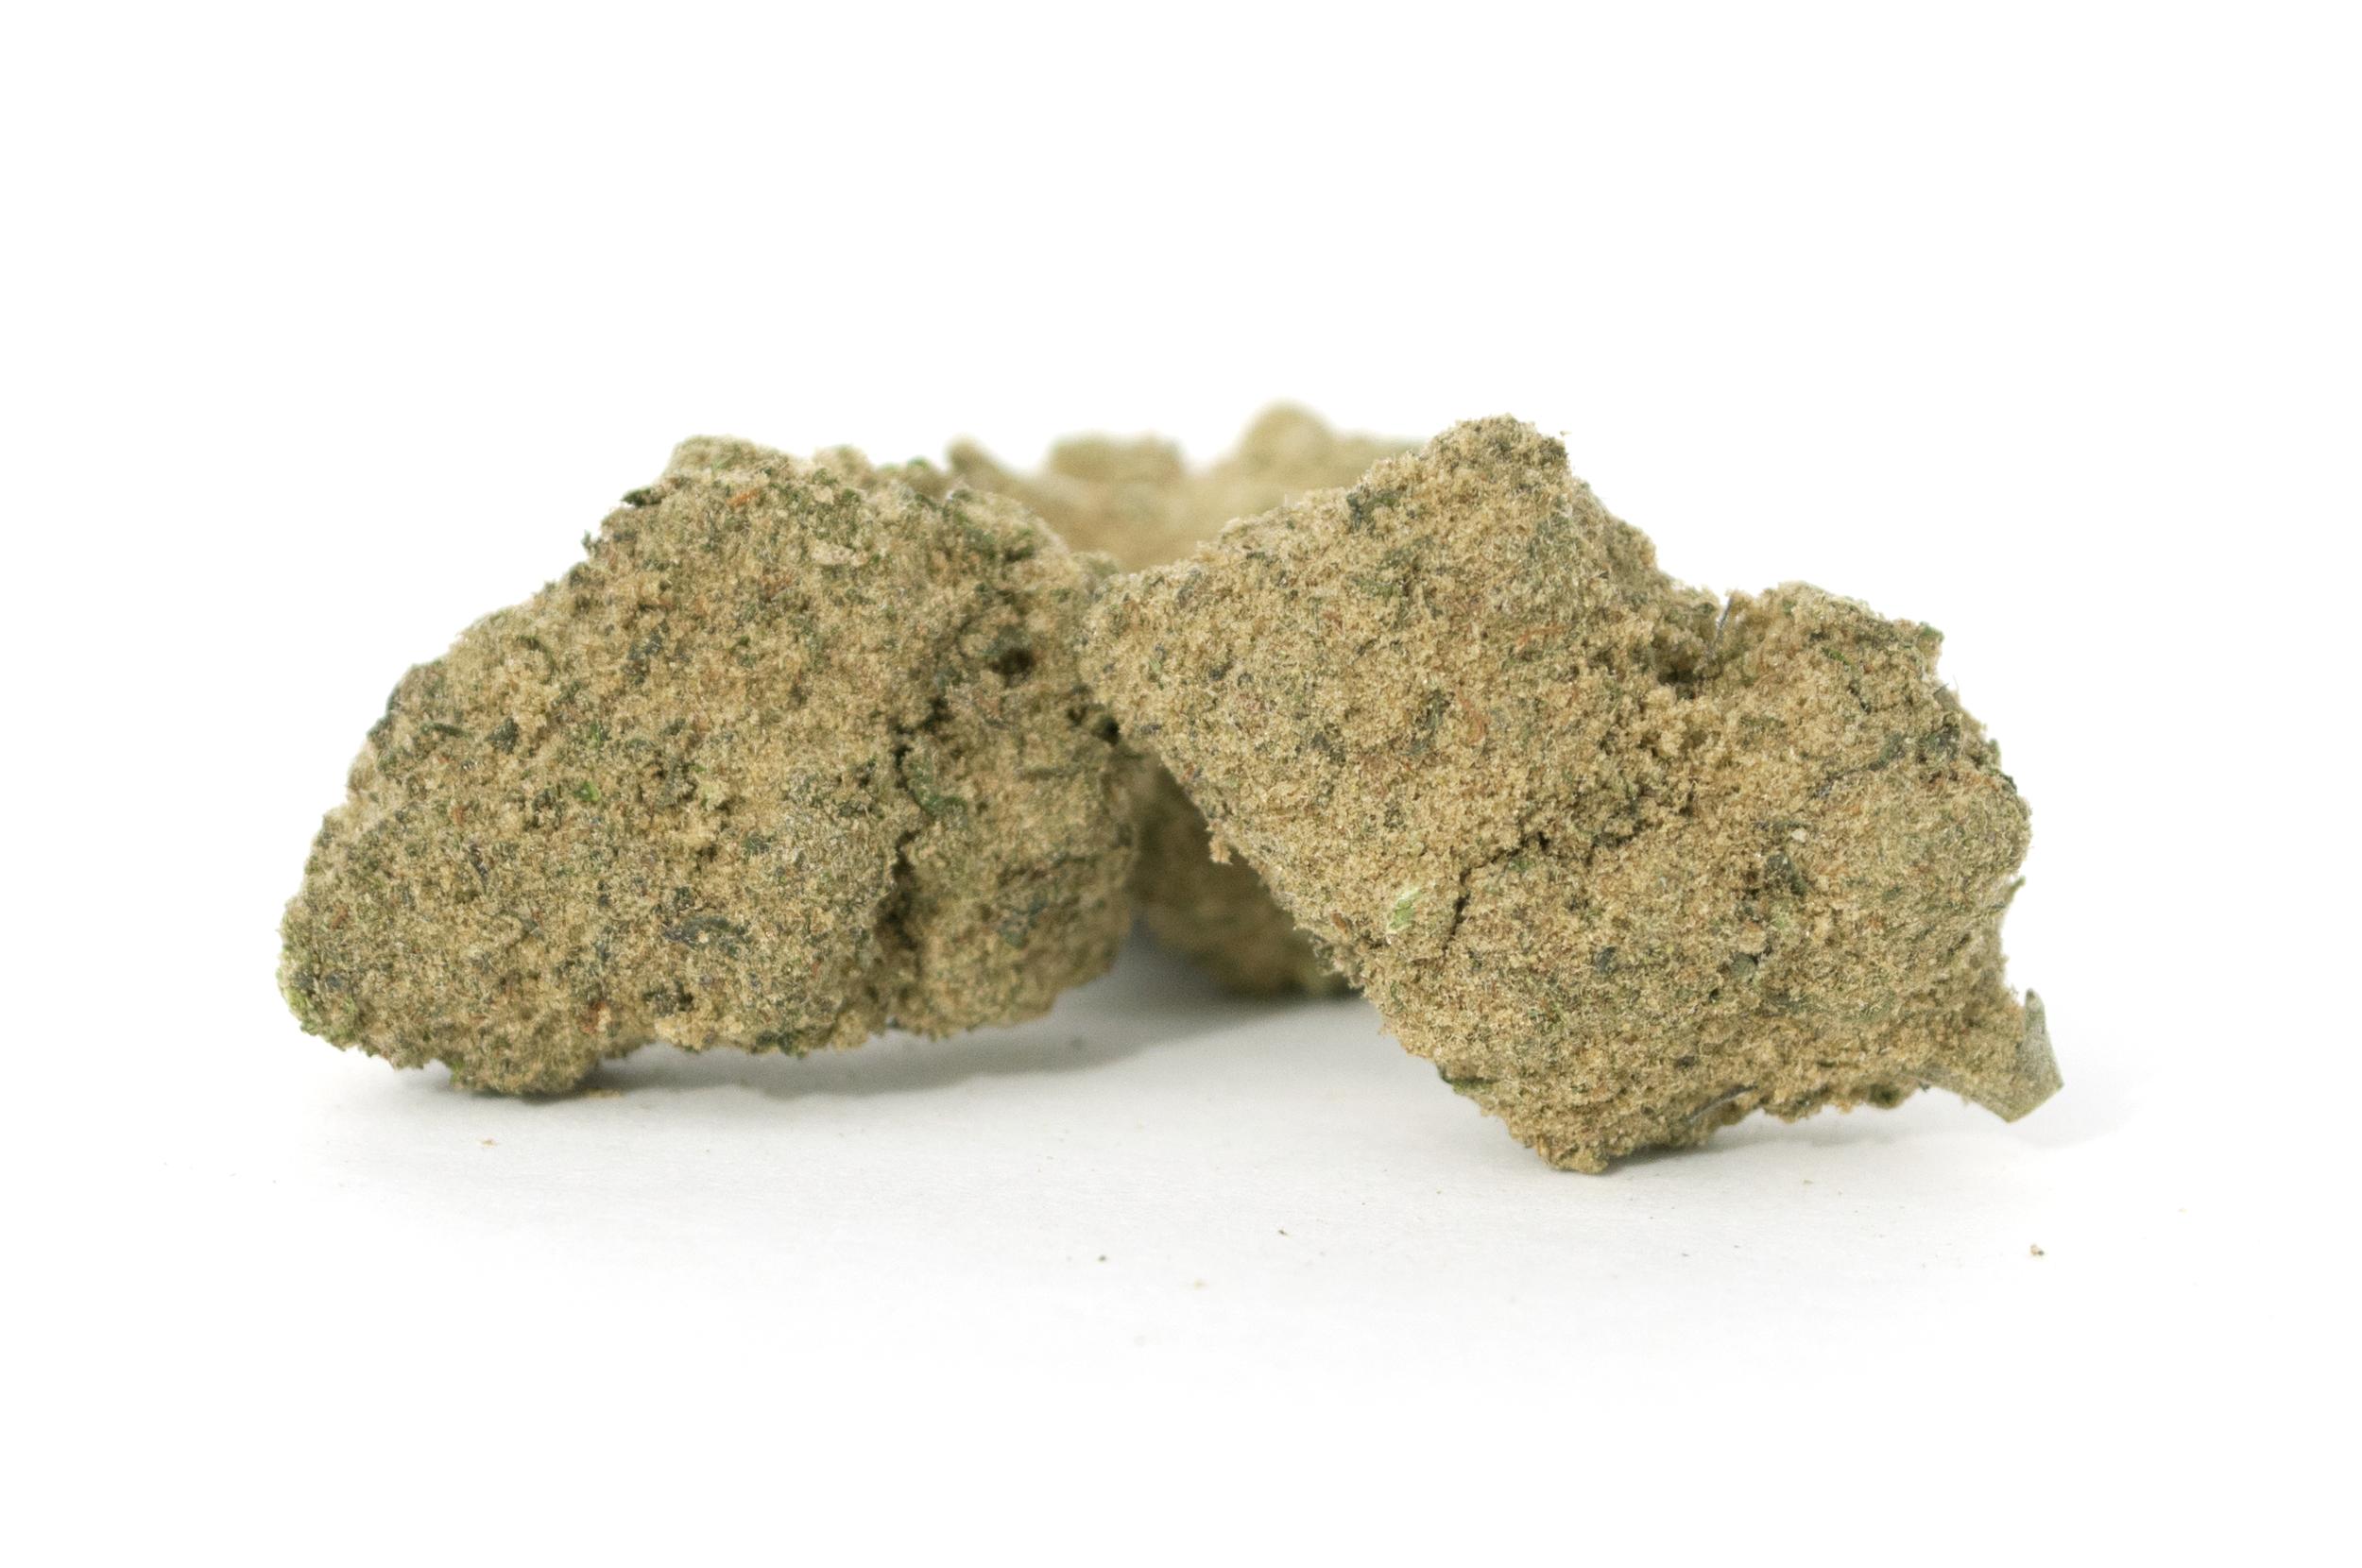 The Original Space Rocks